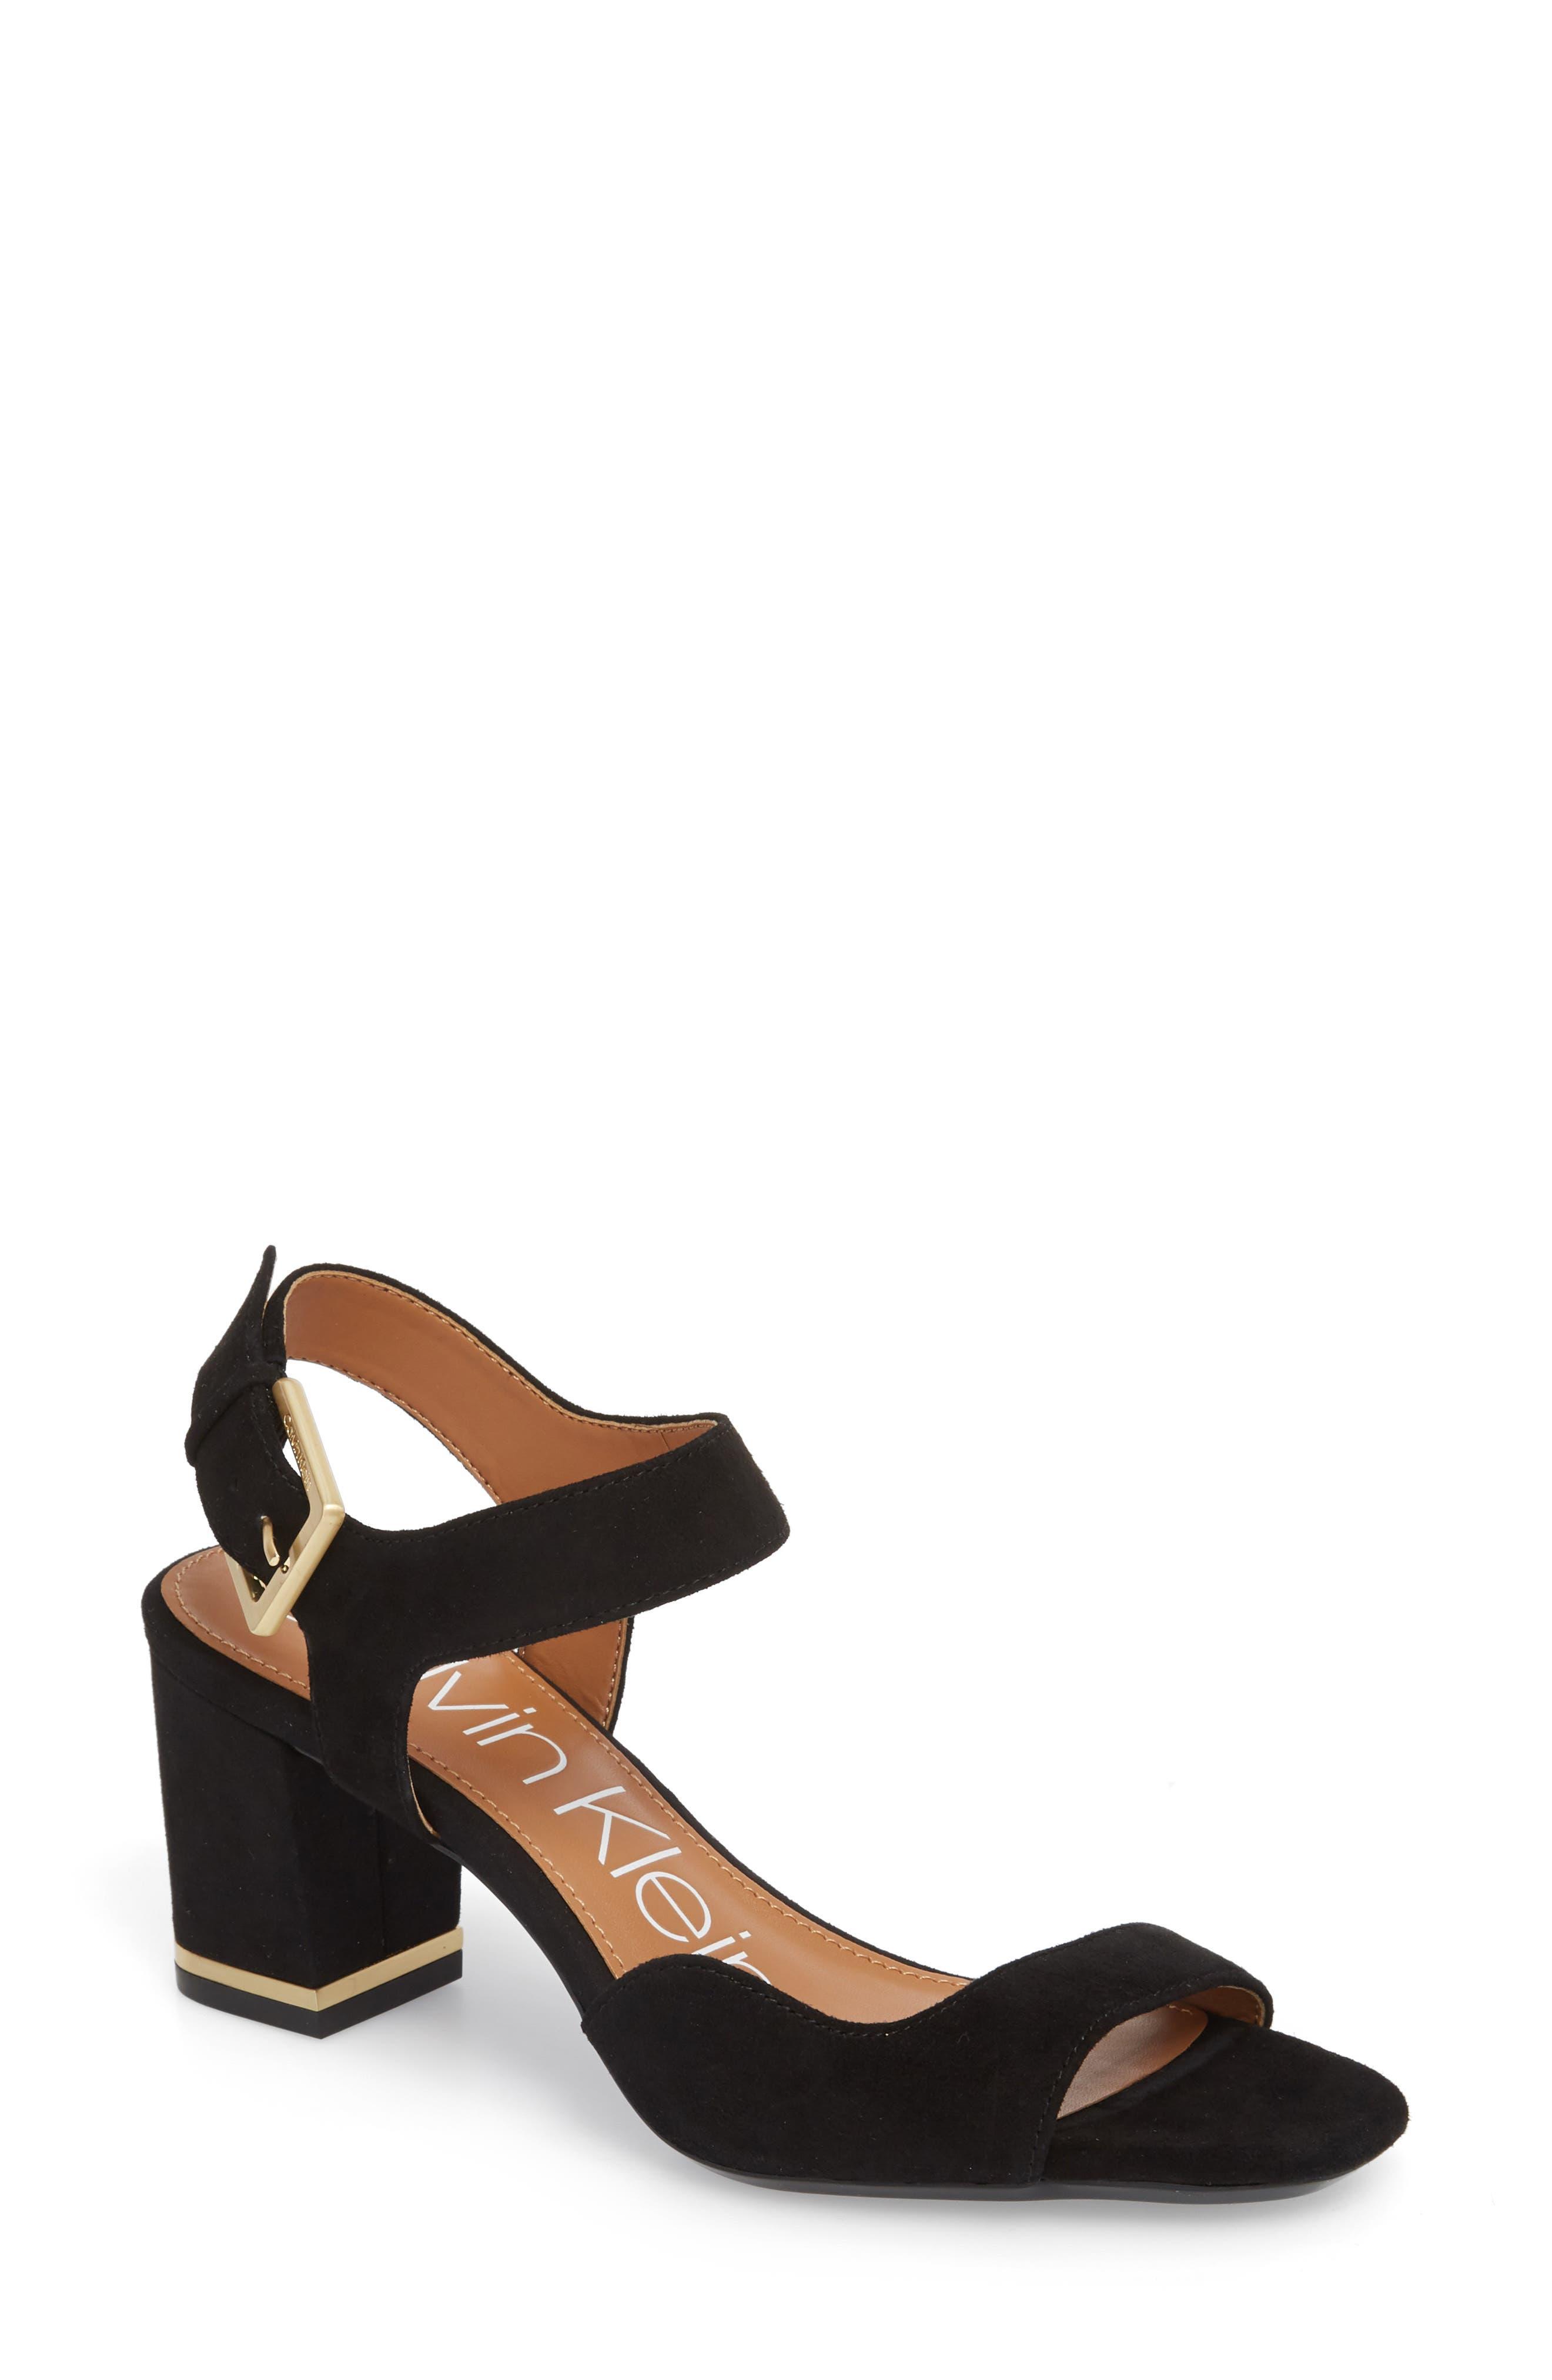 Chantay Asymmetrical Sandal,                         Main,                         color, 001